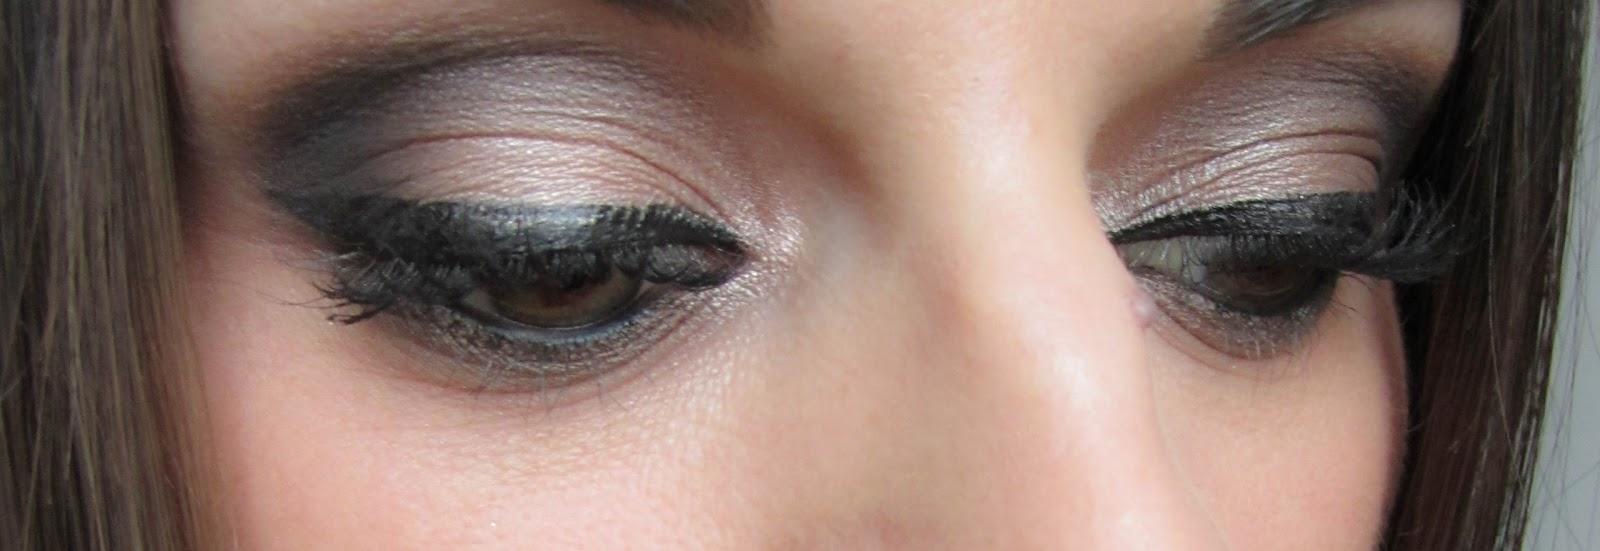 http://chroniquedunemakeupaddict.blogspot.com/2014/10/makeup-automnal-avec-diva-de-chez-mac.html